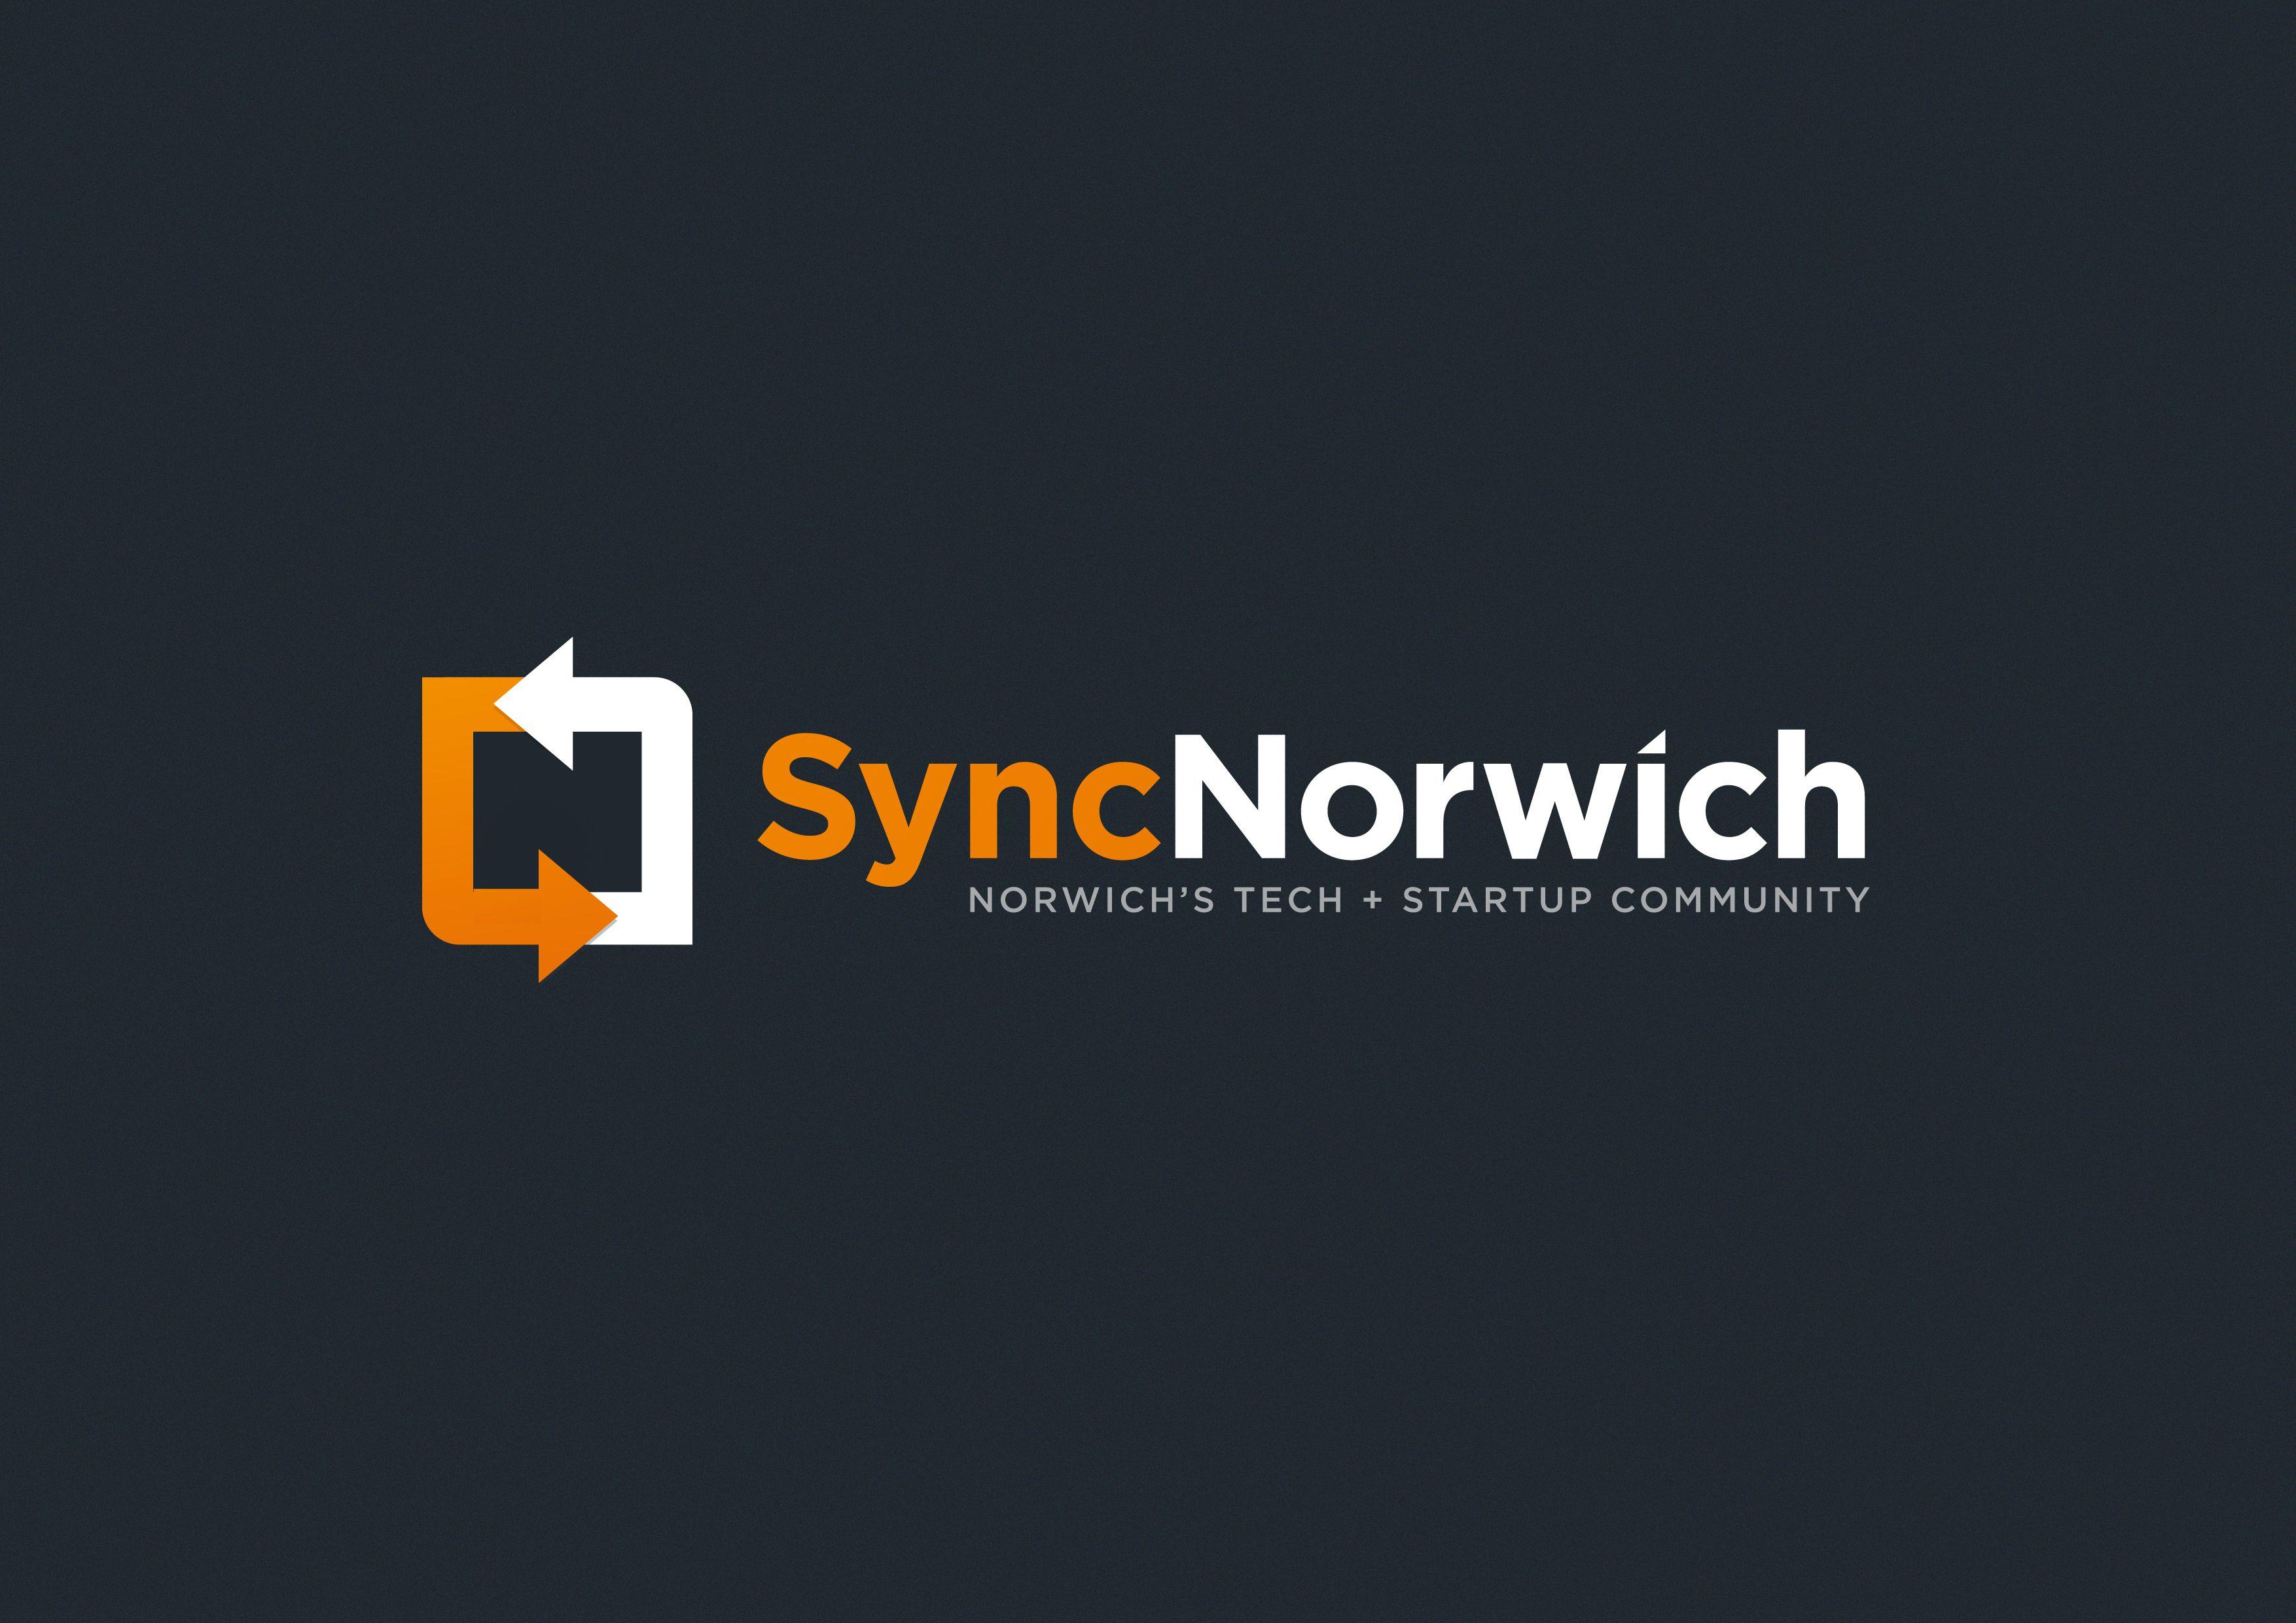 SyncNorwich - Norwich's Tech + Startup Community